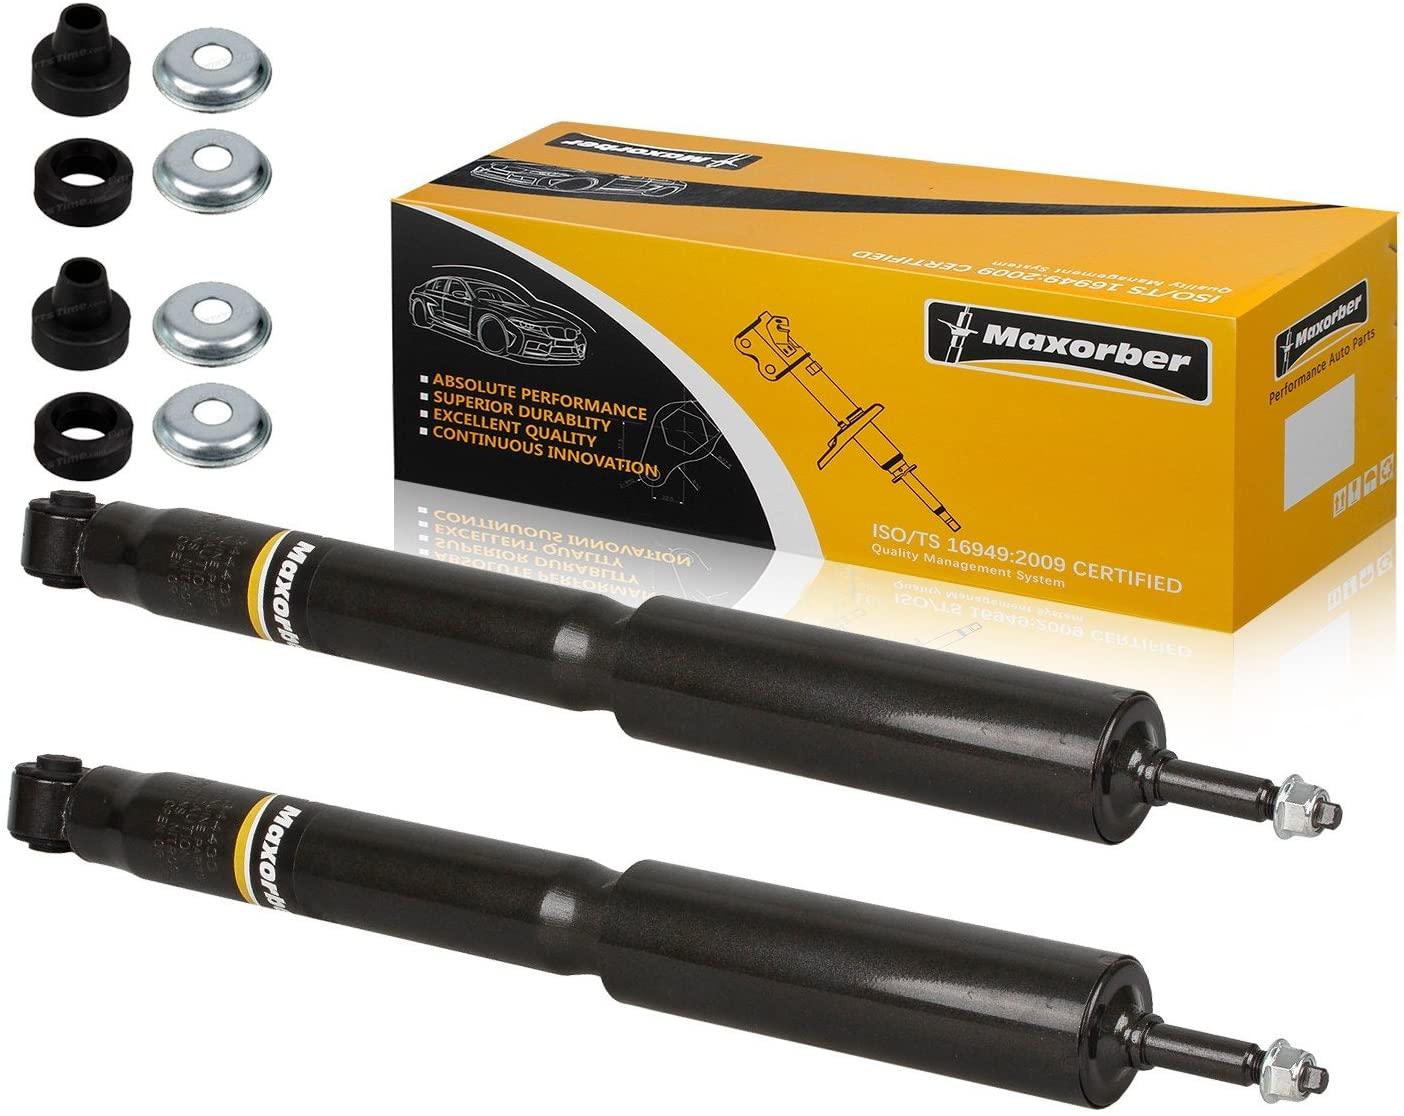 Maxorber Rear Set Shocks Struts Absorber Kit Compatible with Mustang 1994 1995 1996 1997 1998 1999 2000 2001 2002 2003 2004 Shock Absorber 344433 5968